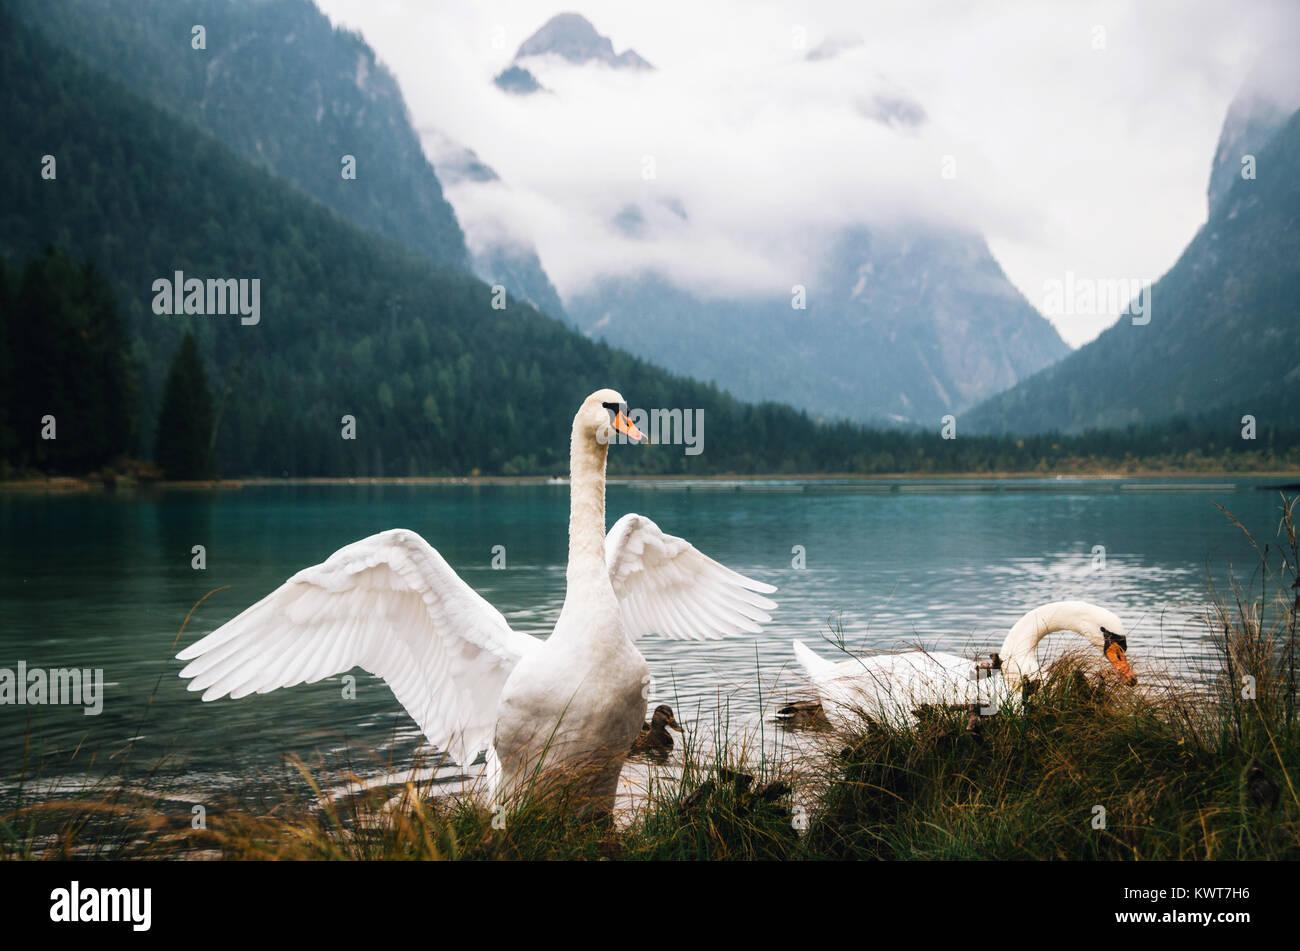 Swans on Dobbiaco Lake in Dolomites, Italian Alps - Stock Image